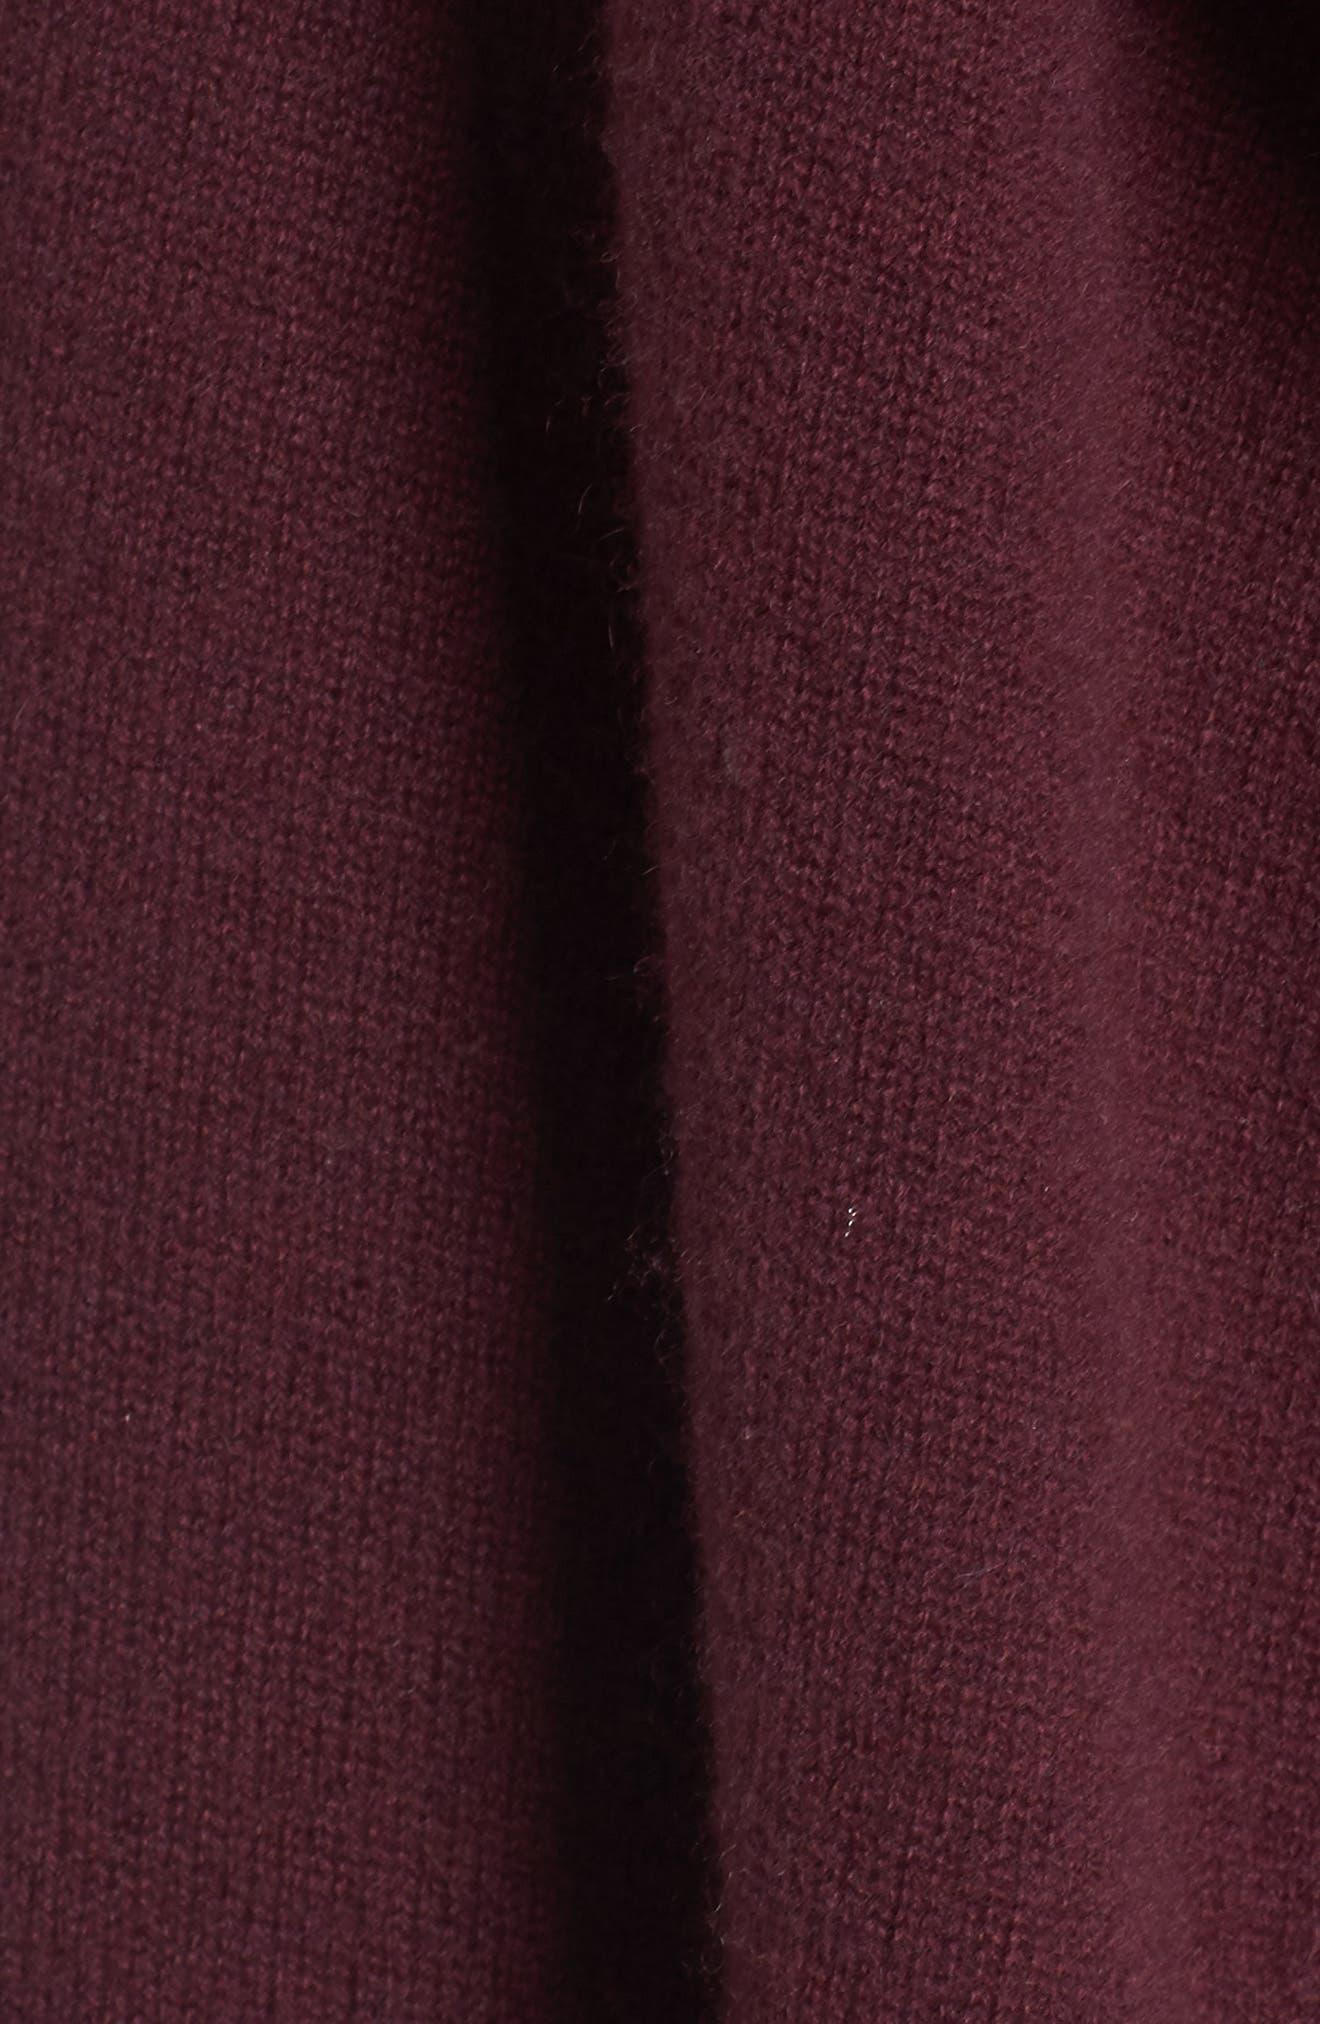 Cashmere Long Drape Front Cardigan,                             Alternate thumbnail 38, color,